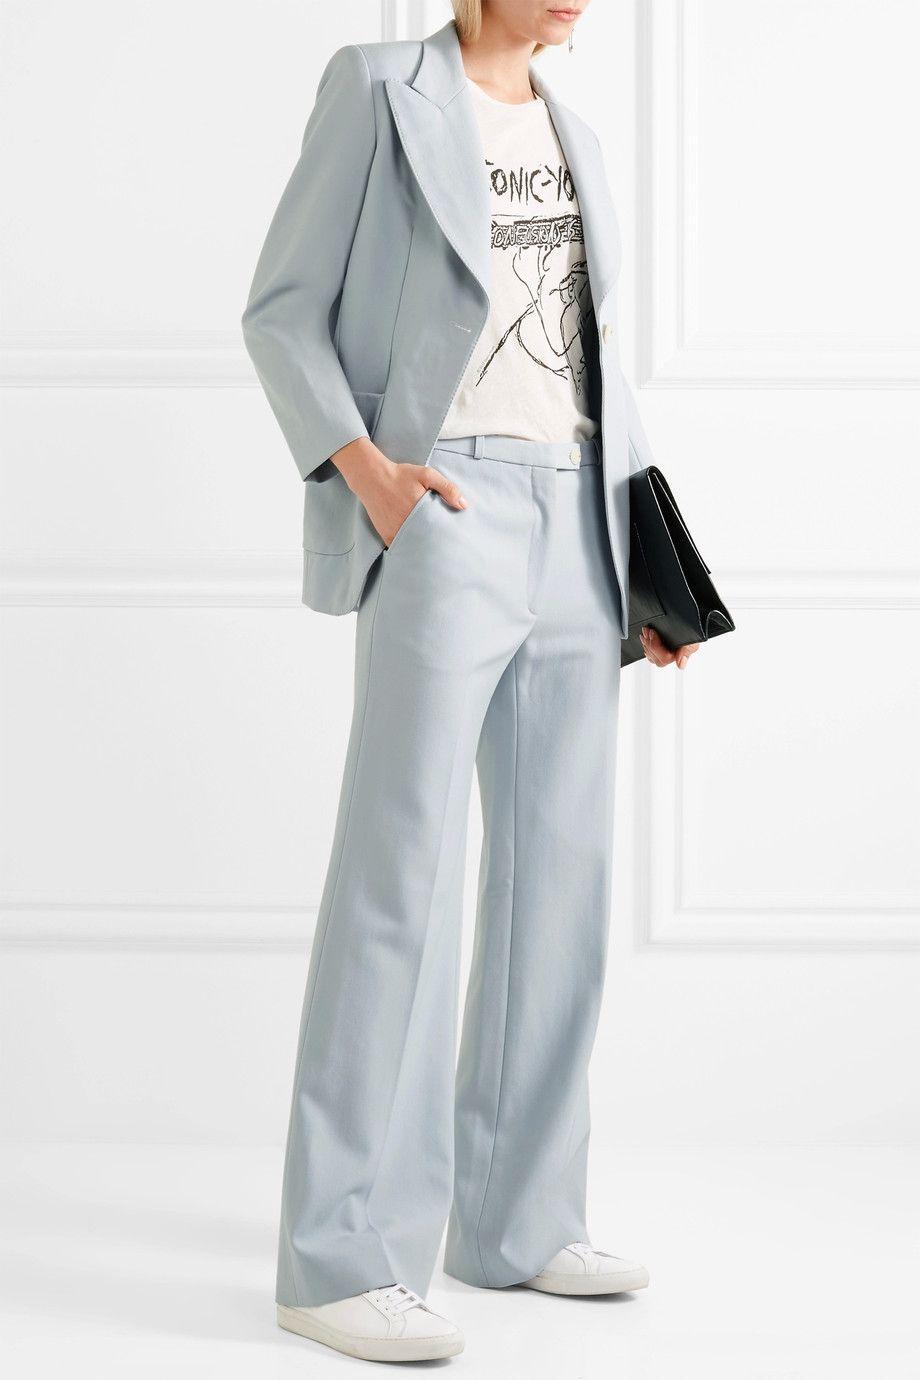 Twill Wide-leg Pants - Sky blue AlexaChung 74ZV4upl